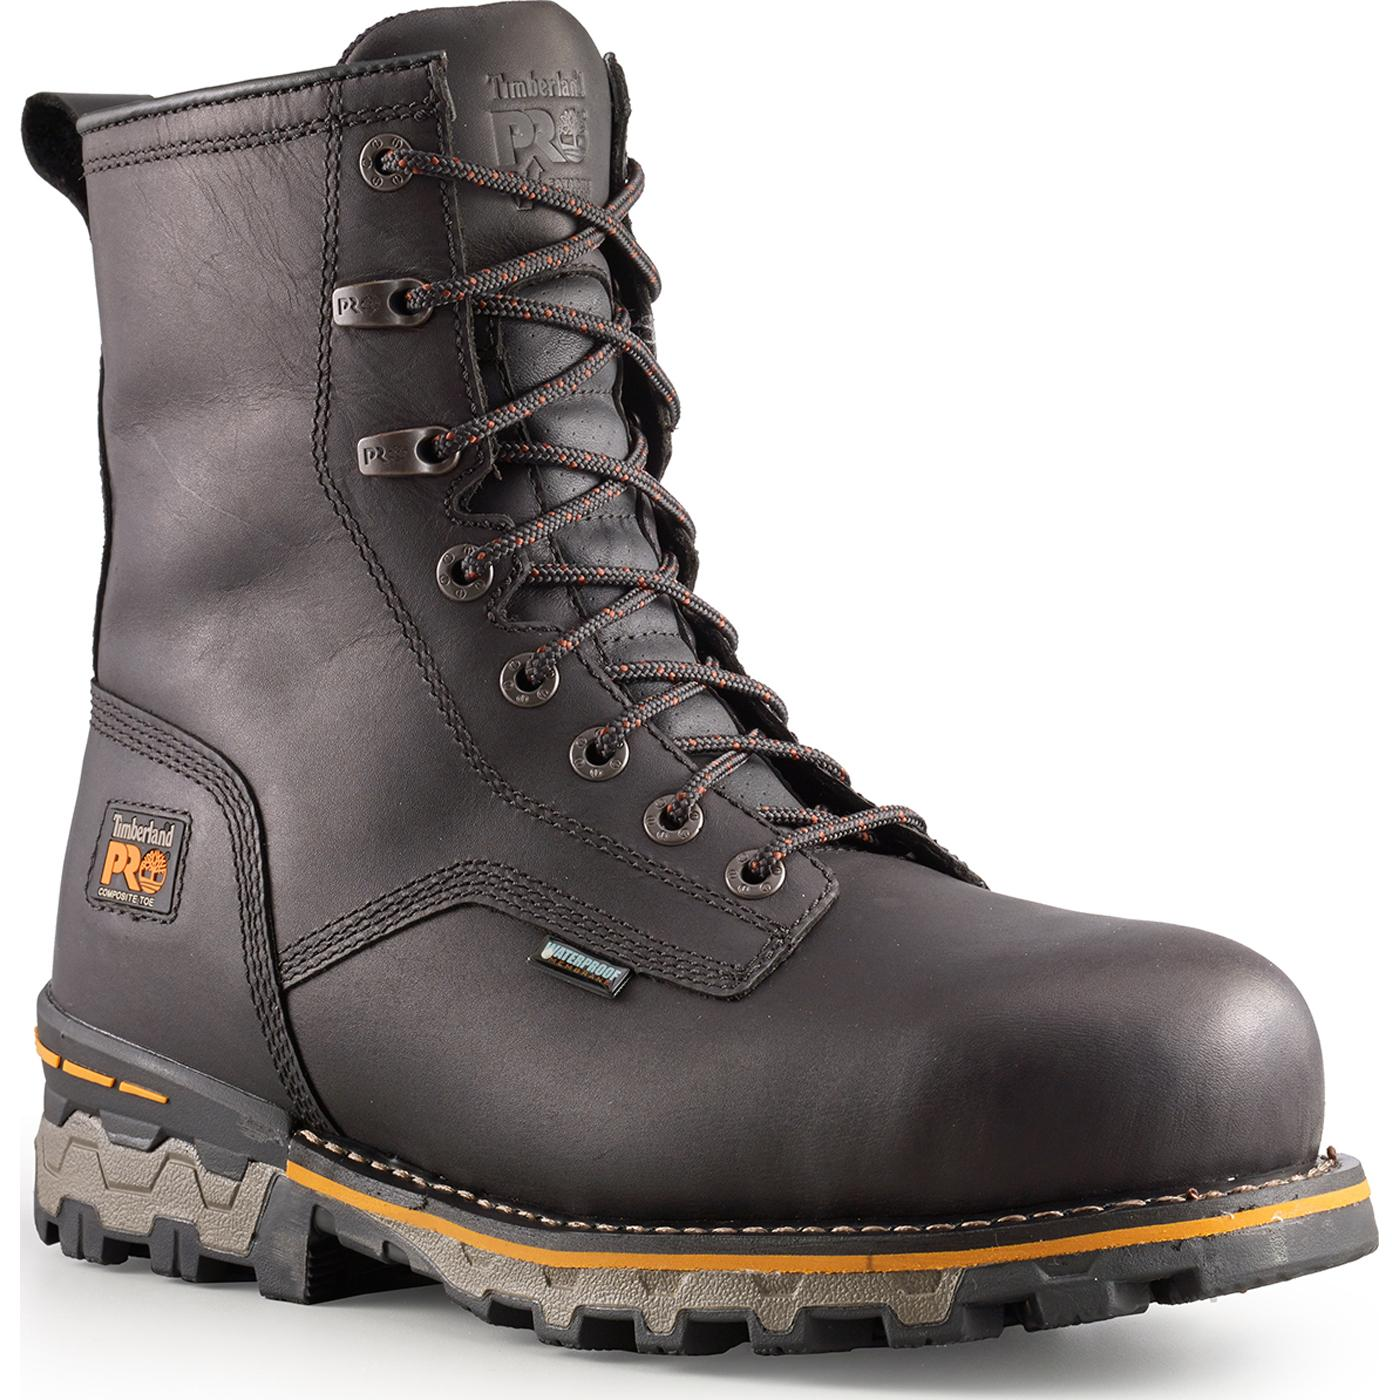 9189d4dbc022 Timberland PRO TiTAN Boondock Composite Toe Waterproof Work Boot